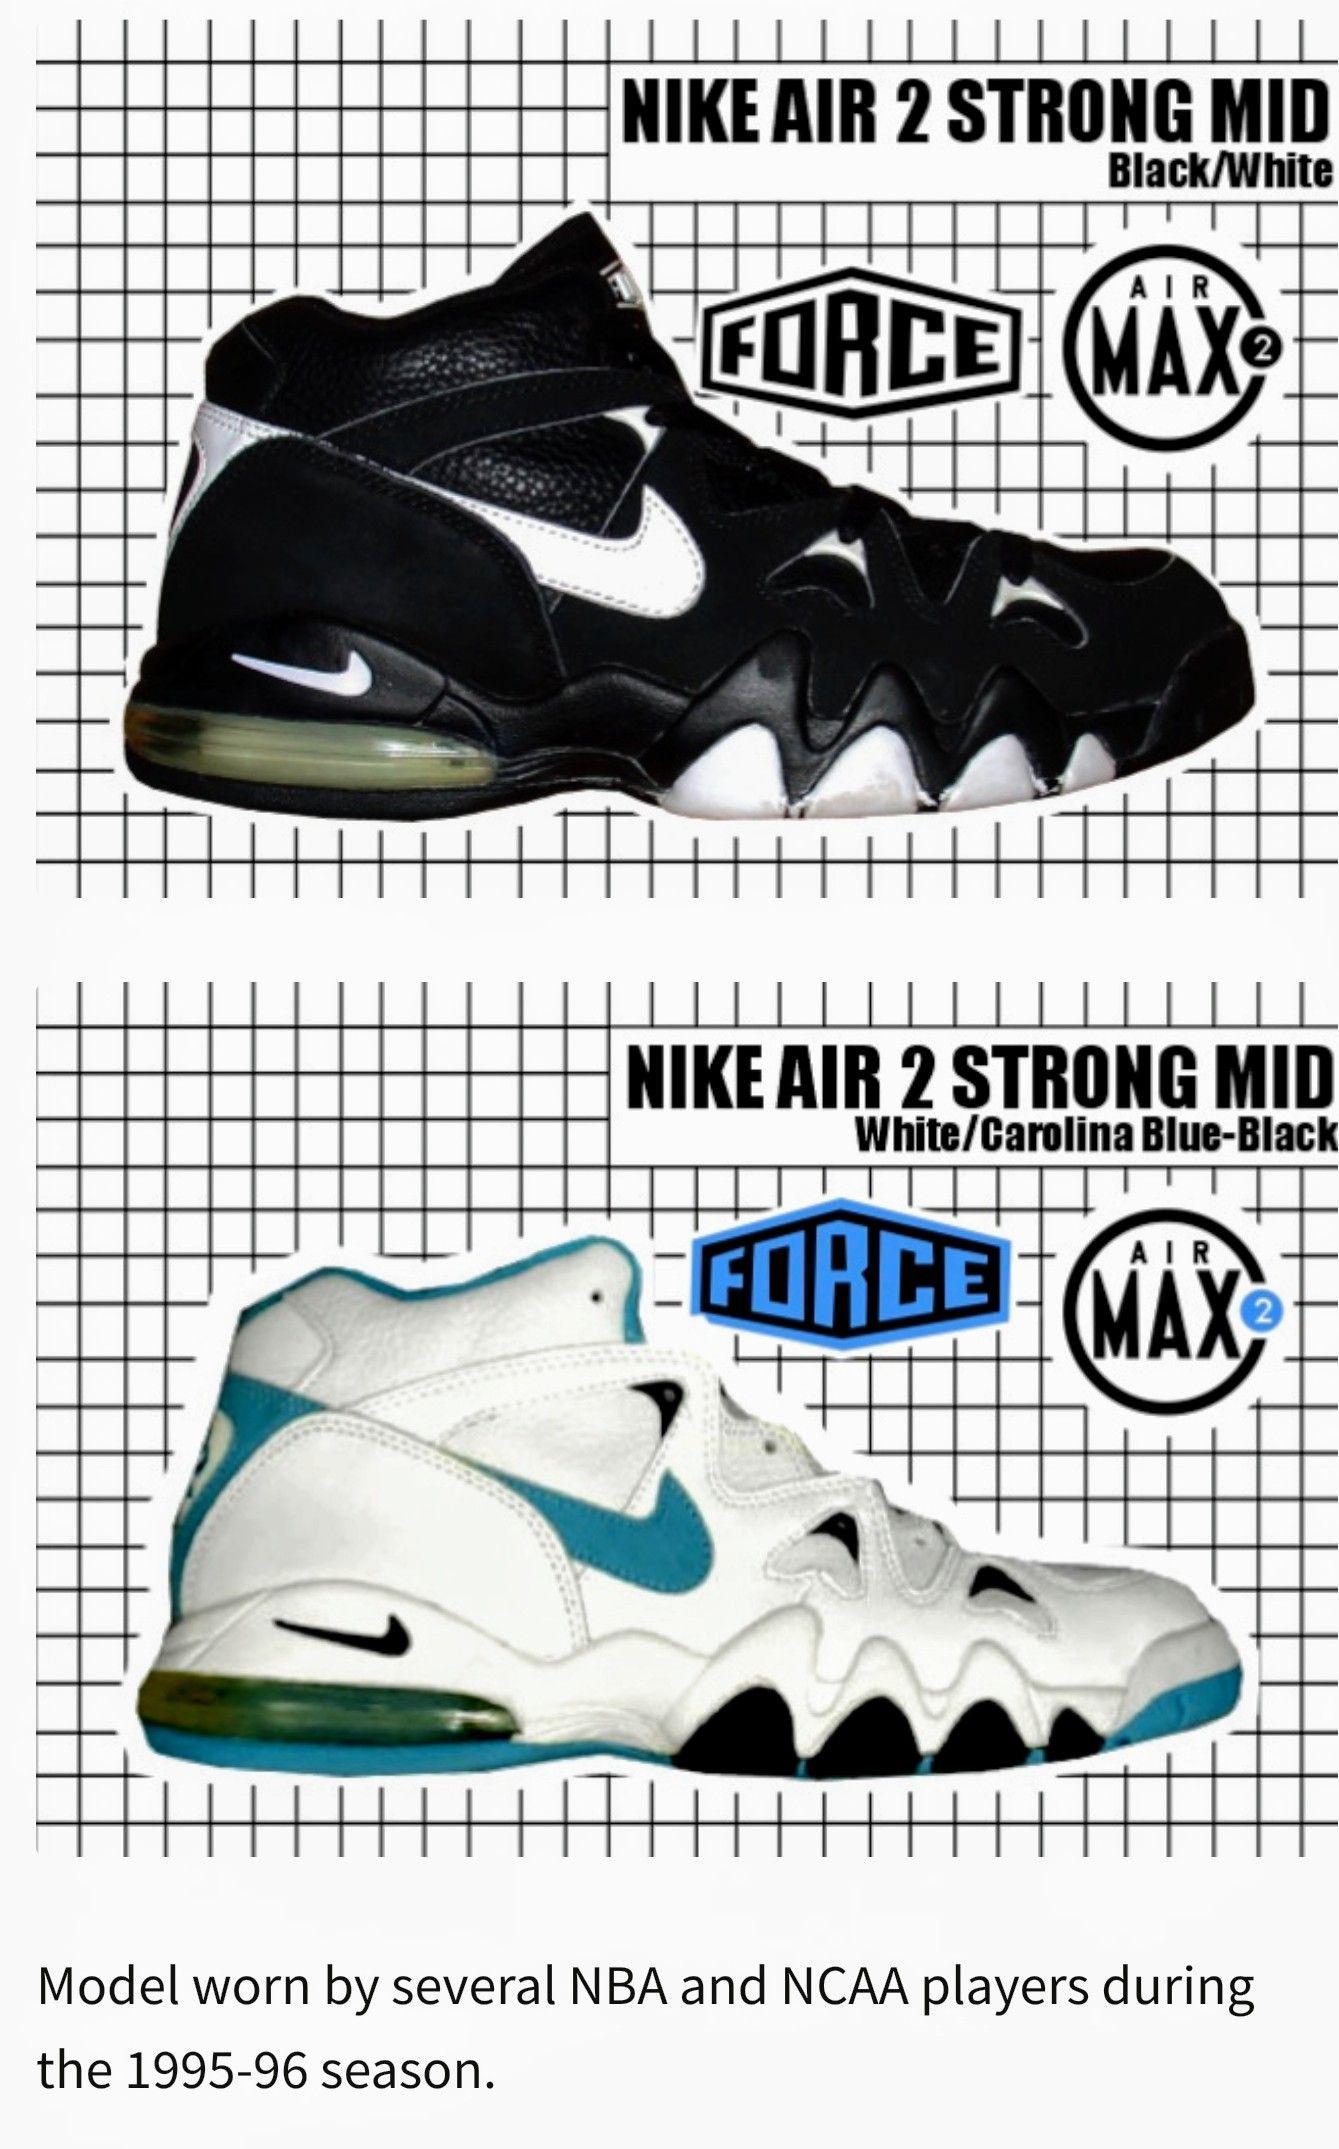 newest 2ba9a de639 Nike air zoom kidd  Basketball  sko  Pinterest  Nike, Nike air og  Sneakers